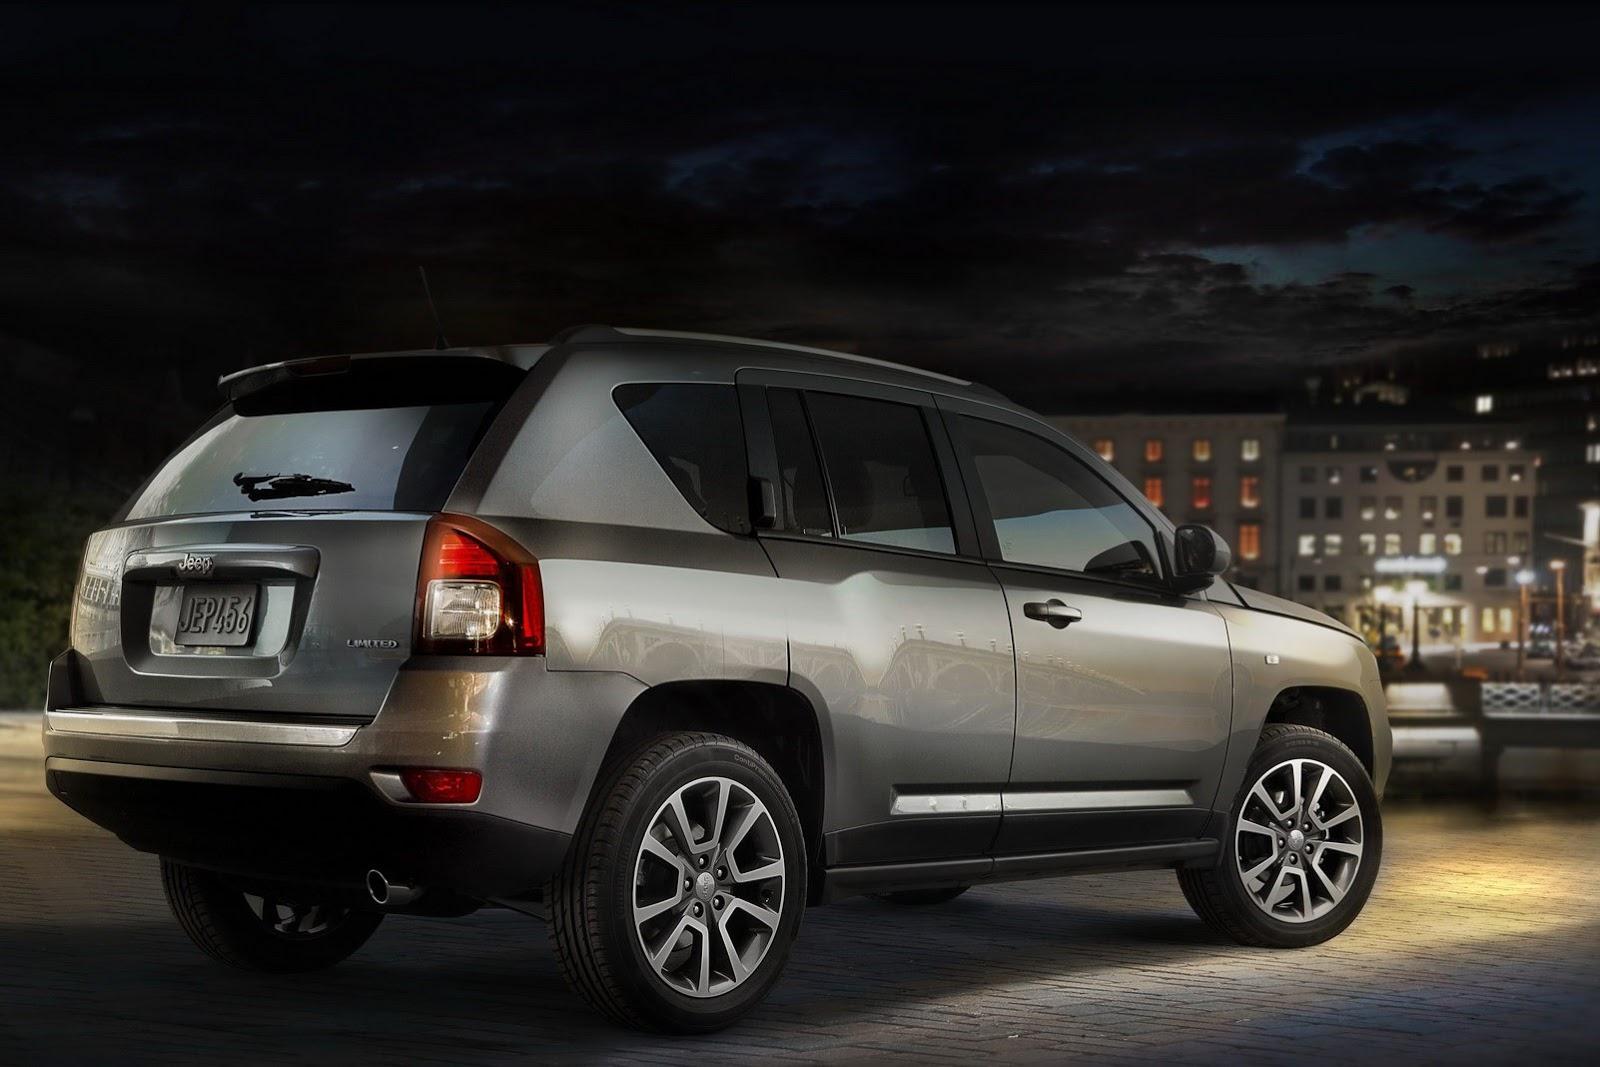 2014 jeep compass to make european debut in geneva autoevolution. Black Bedroom Furniture Sets. Home Design Ideas